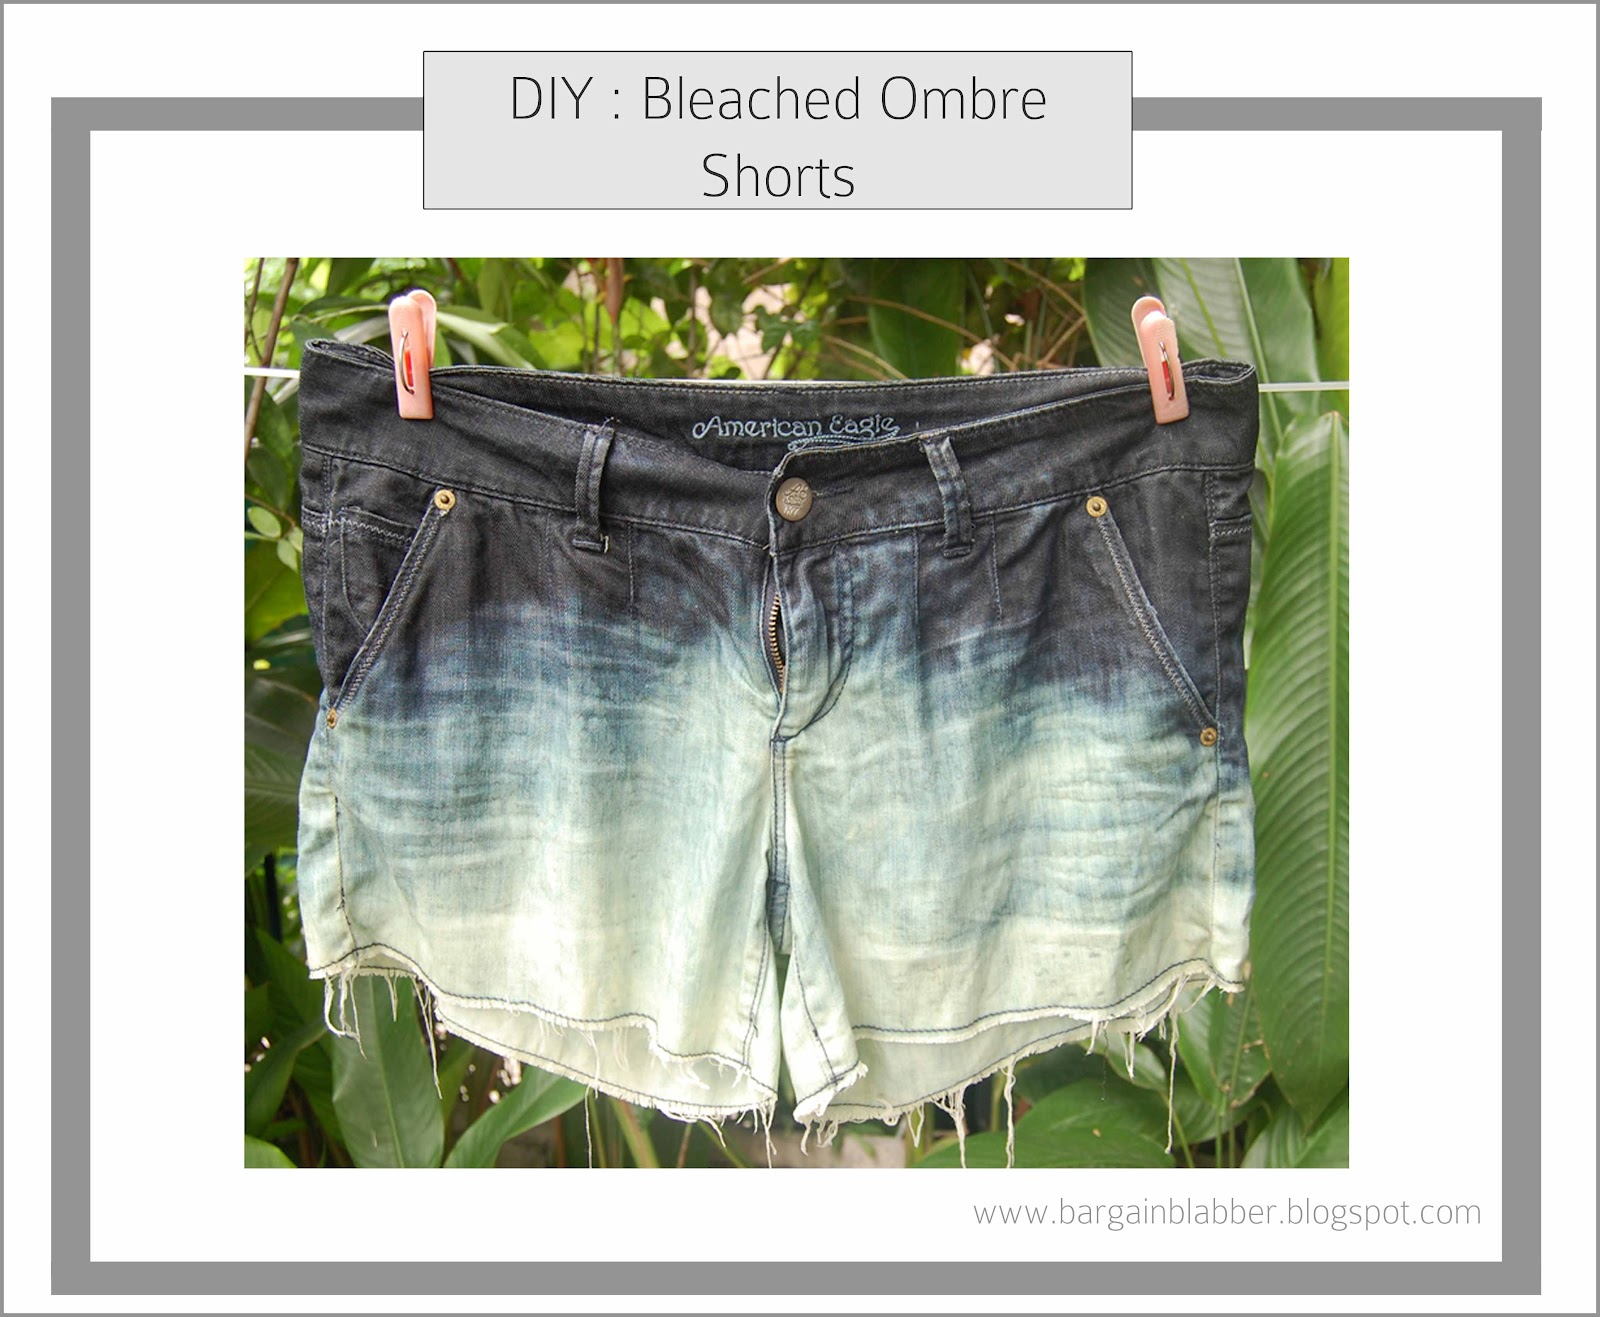 DIY: Bleached Ombre Shorts ~ Bargain Blabber